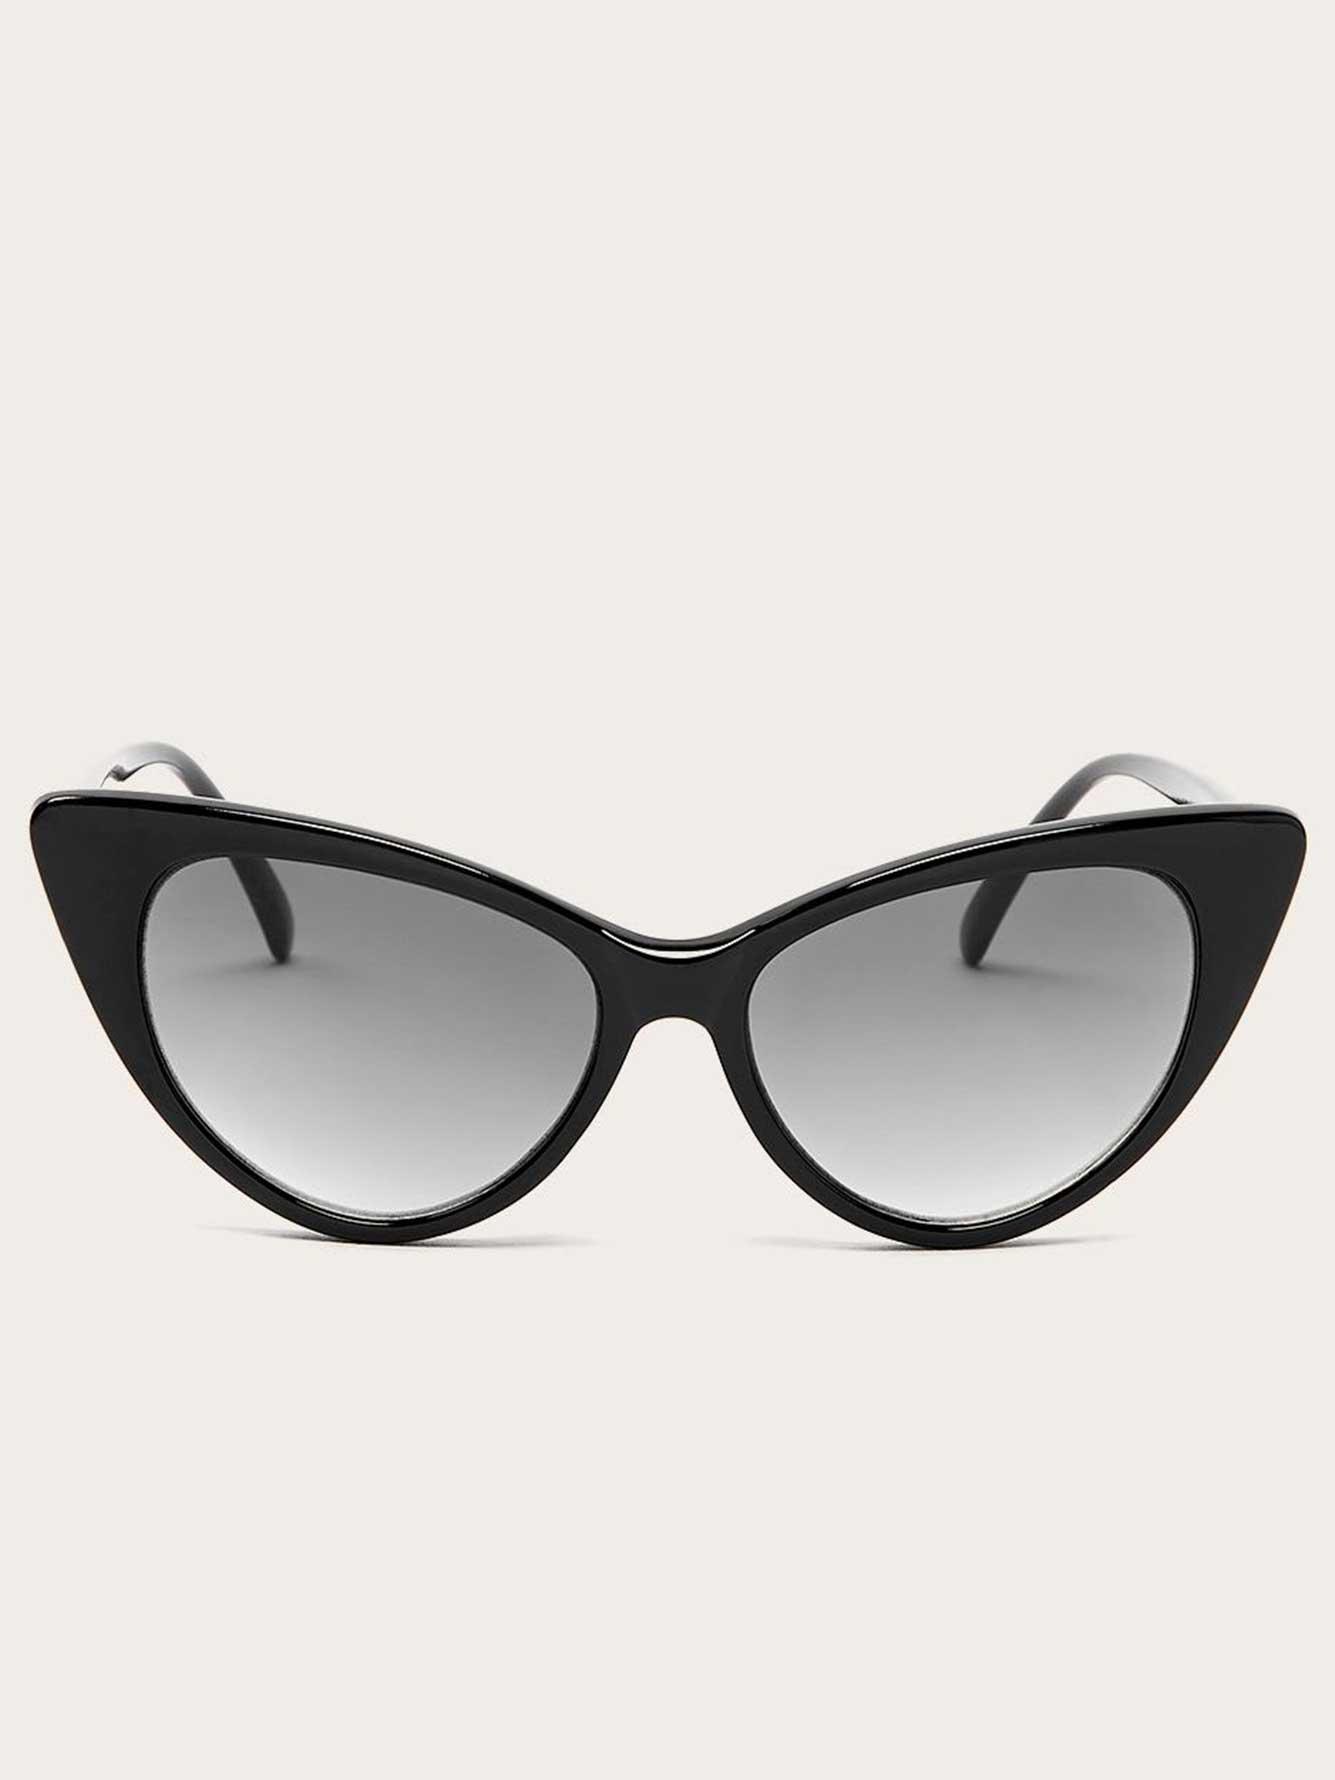 7ee1b0d0895f Black cat eye sunglasses penningtons jpg 1000x1250 Black cat eye sunglasses